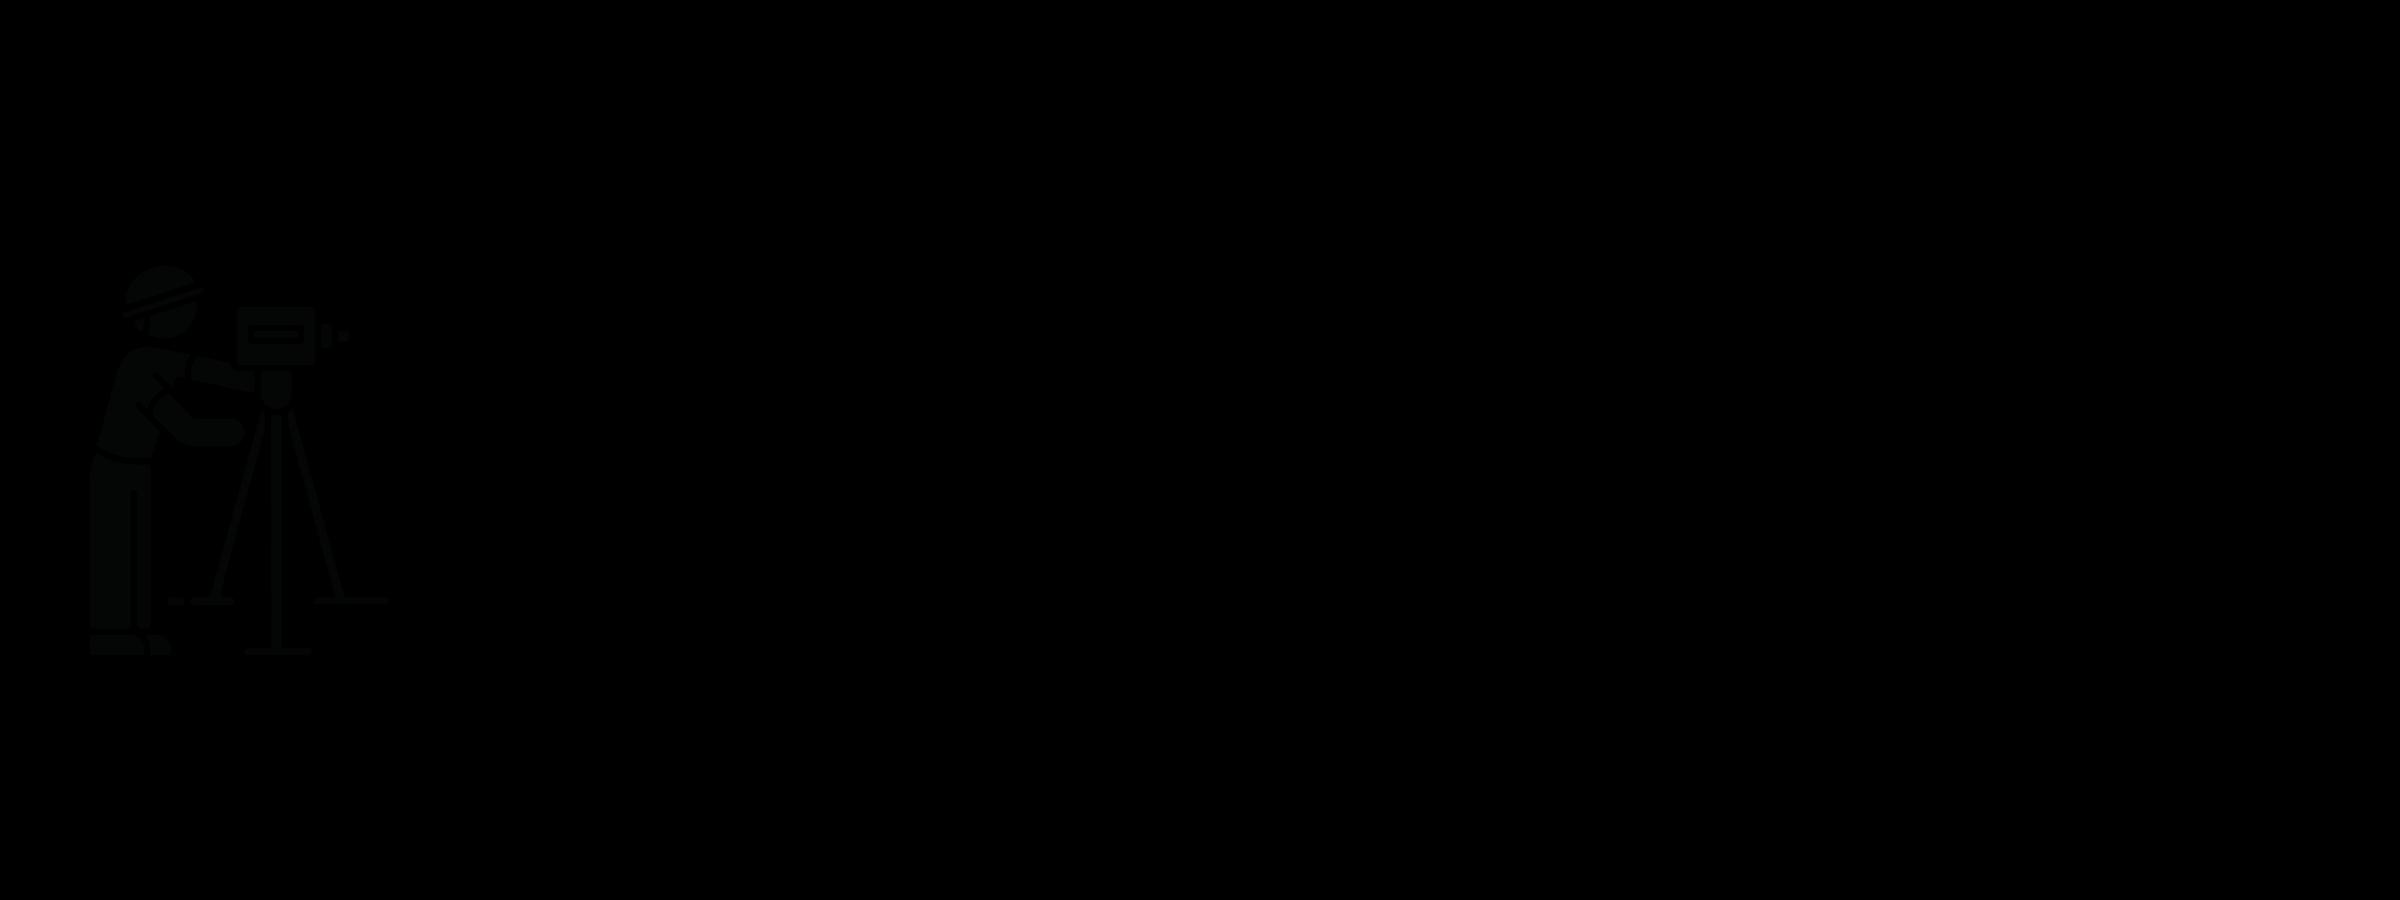 this image shows the logo of la lidar